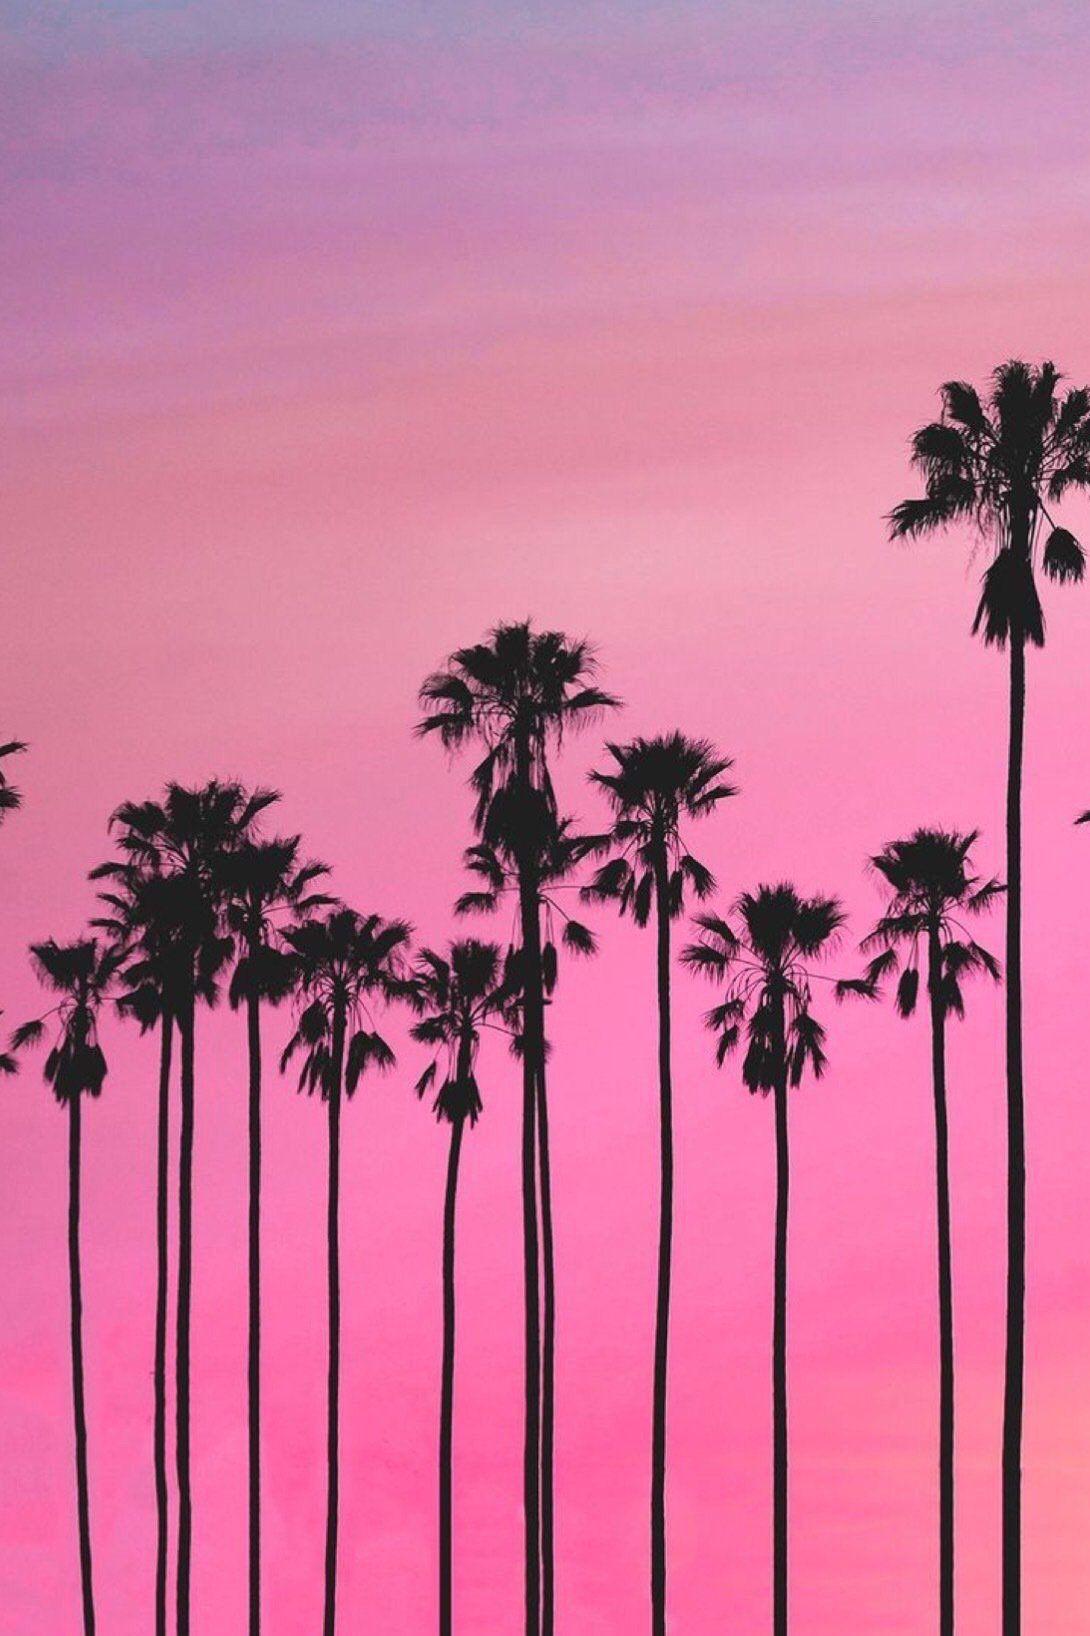 Pink Palm Sunset Wallpaper Tree Sunset Wallpaper Palm Trees Wallpaper